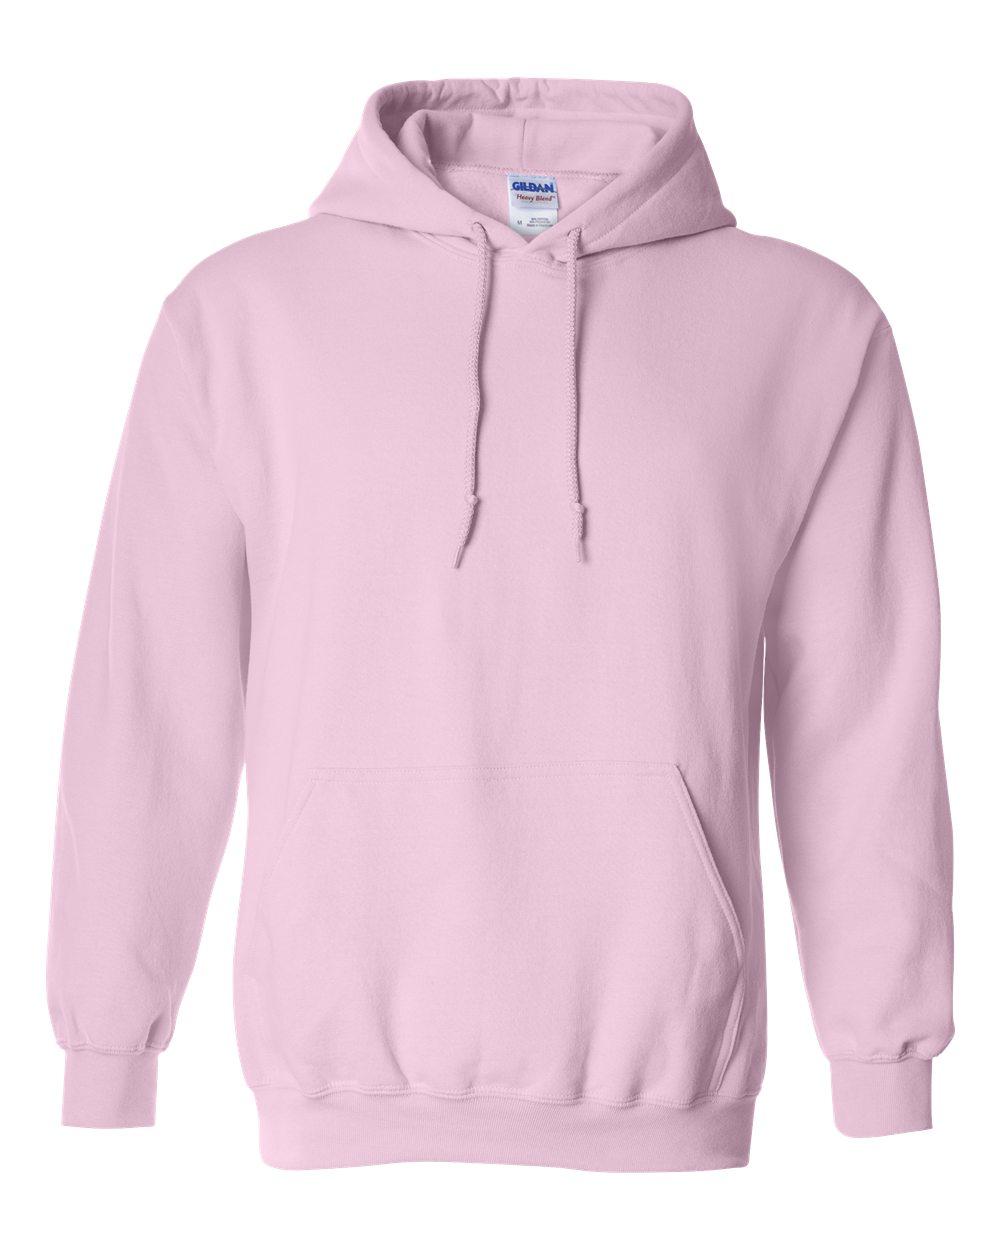 Gildan-Mens-Blank-Hoodie-Heavy-Blend-Hooded-Sweatshirt-Solid-18500-up-to-5XL thumbnail 53